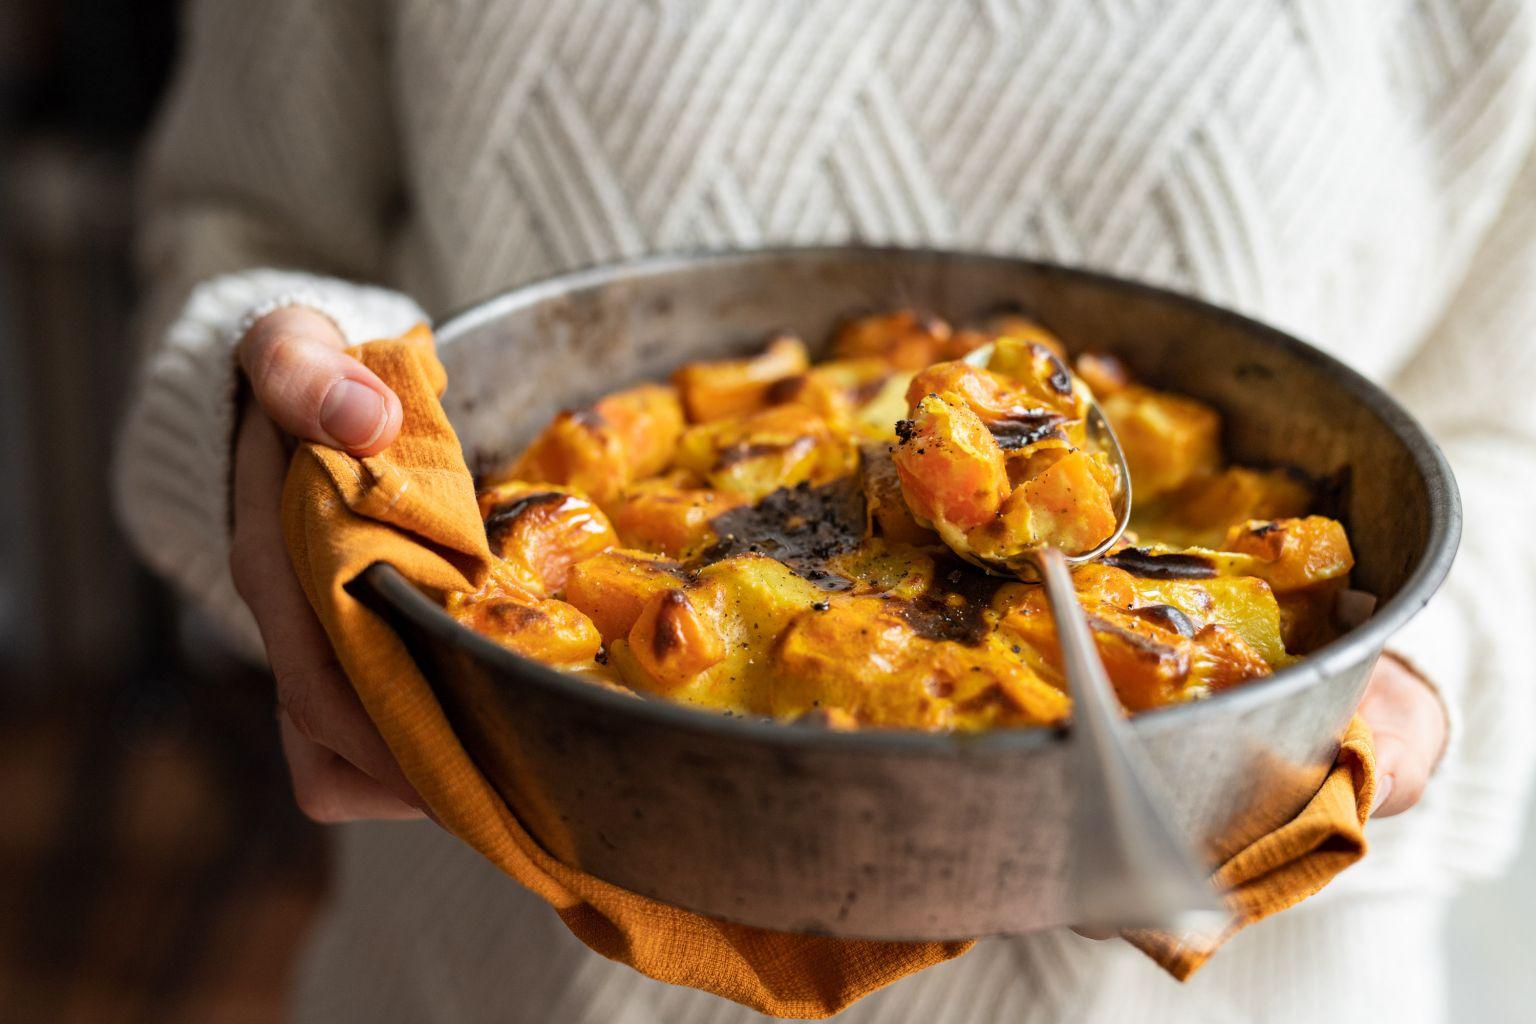 Gratin de butternut et béchamel au curry